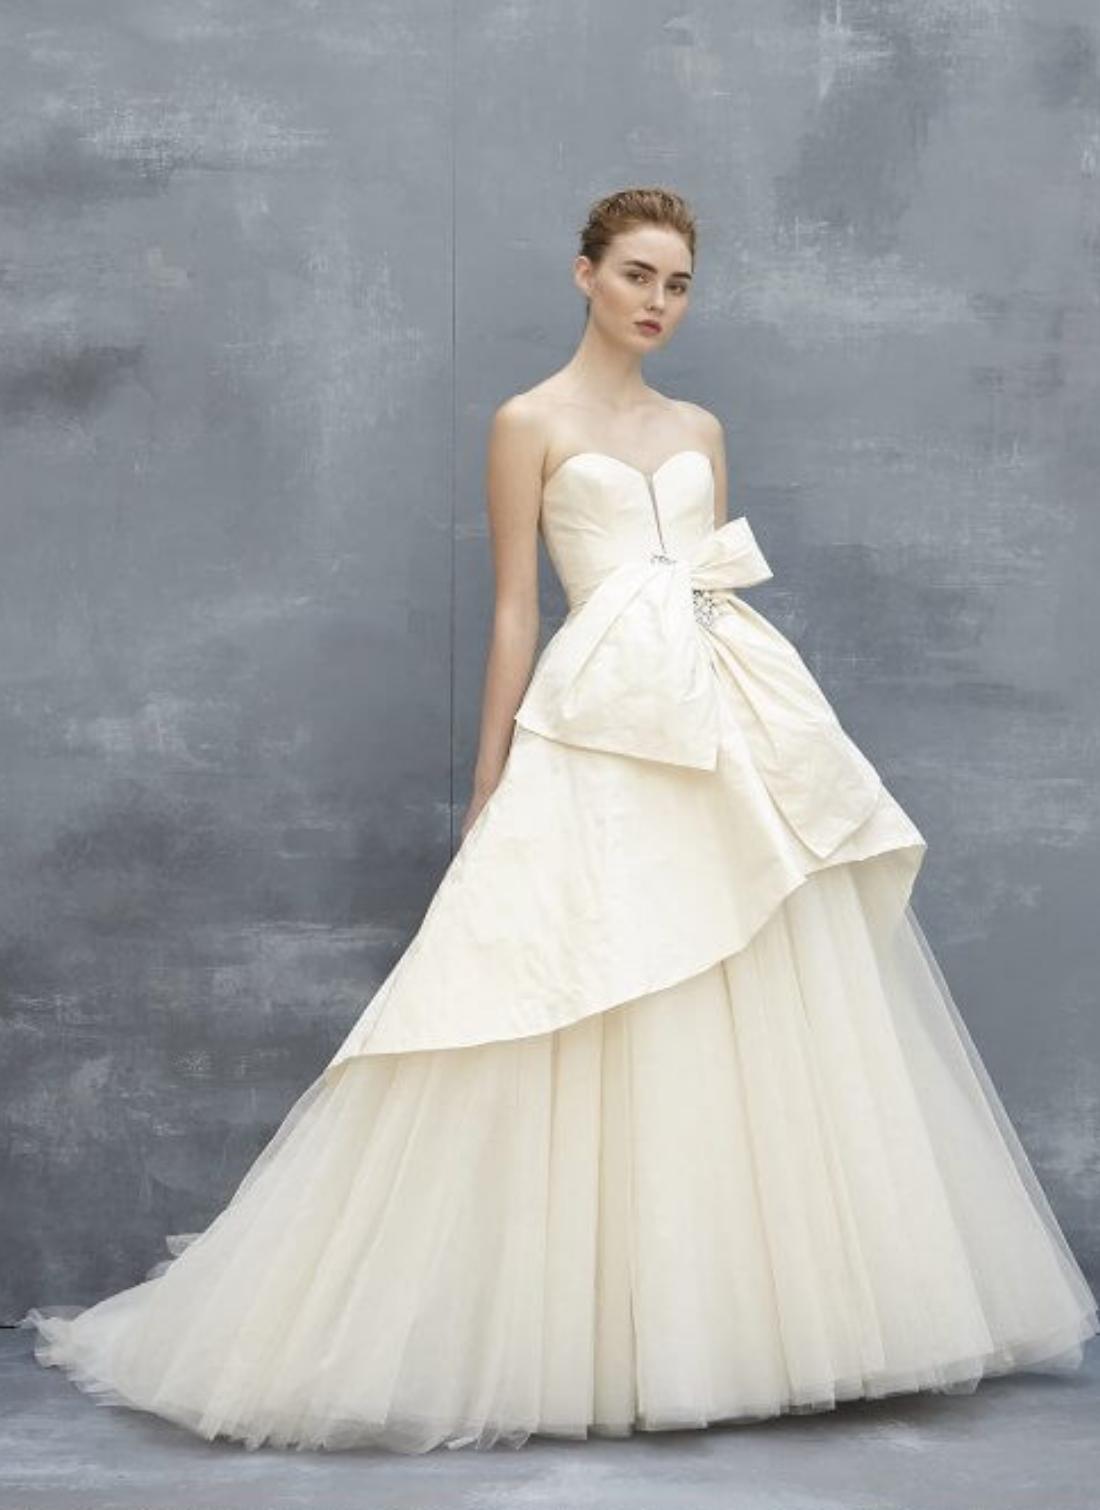 Joan Pillow Bridal Salon - Wedding Dresses - Weddings in Houston